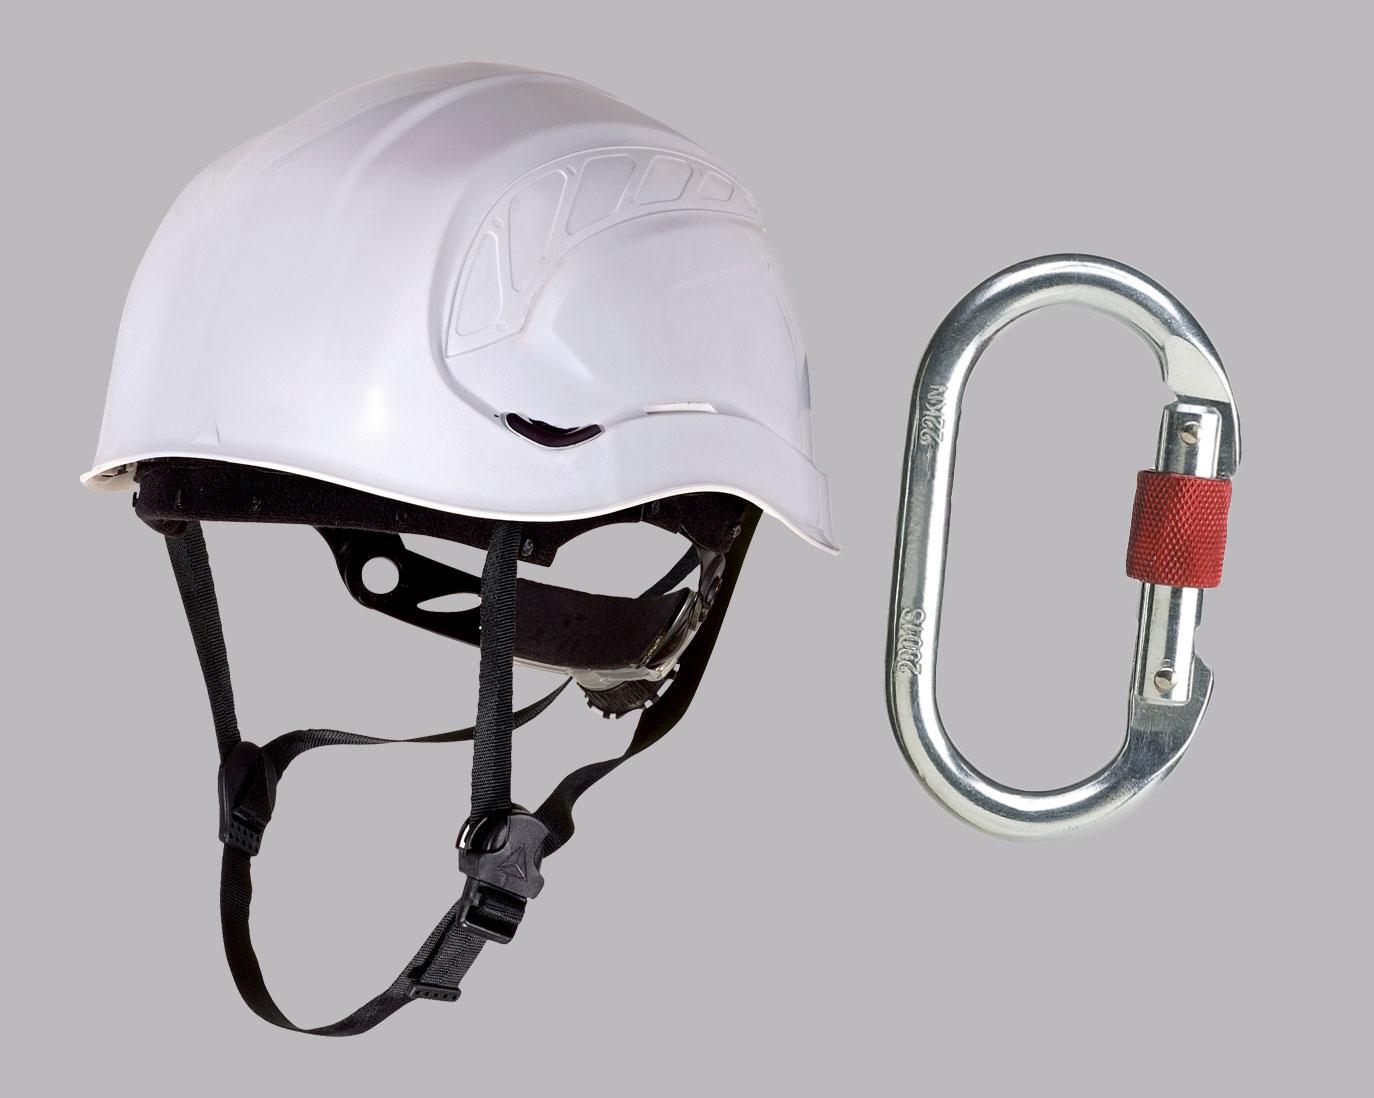 Fall Arrest Accessories